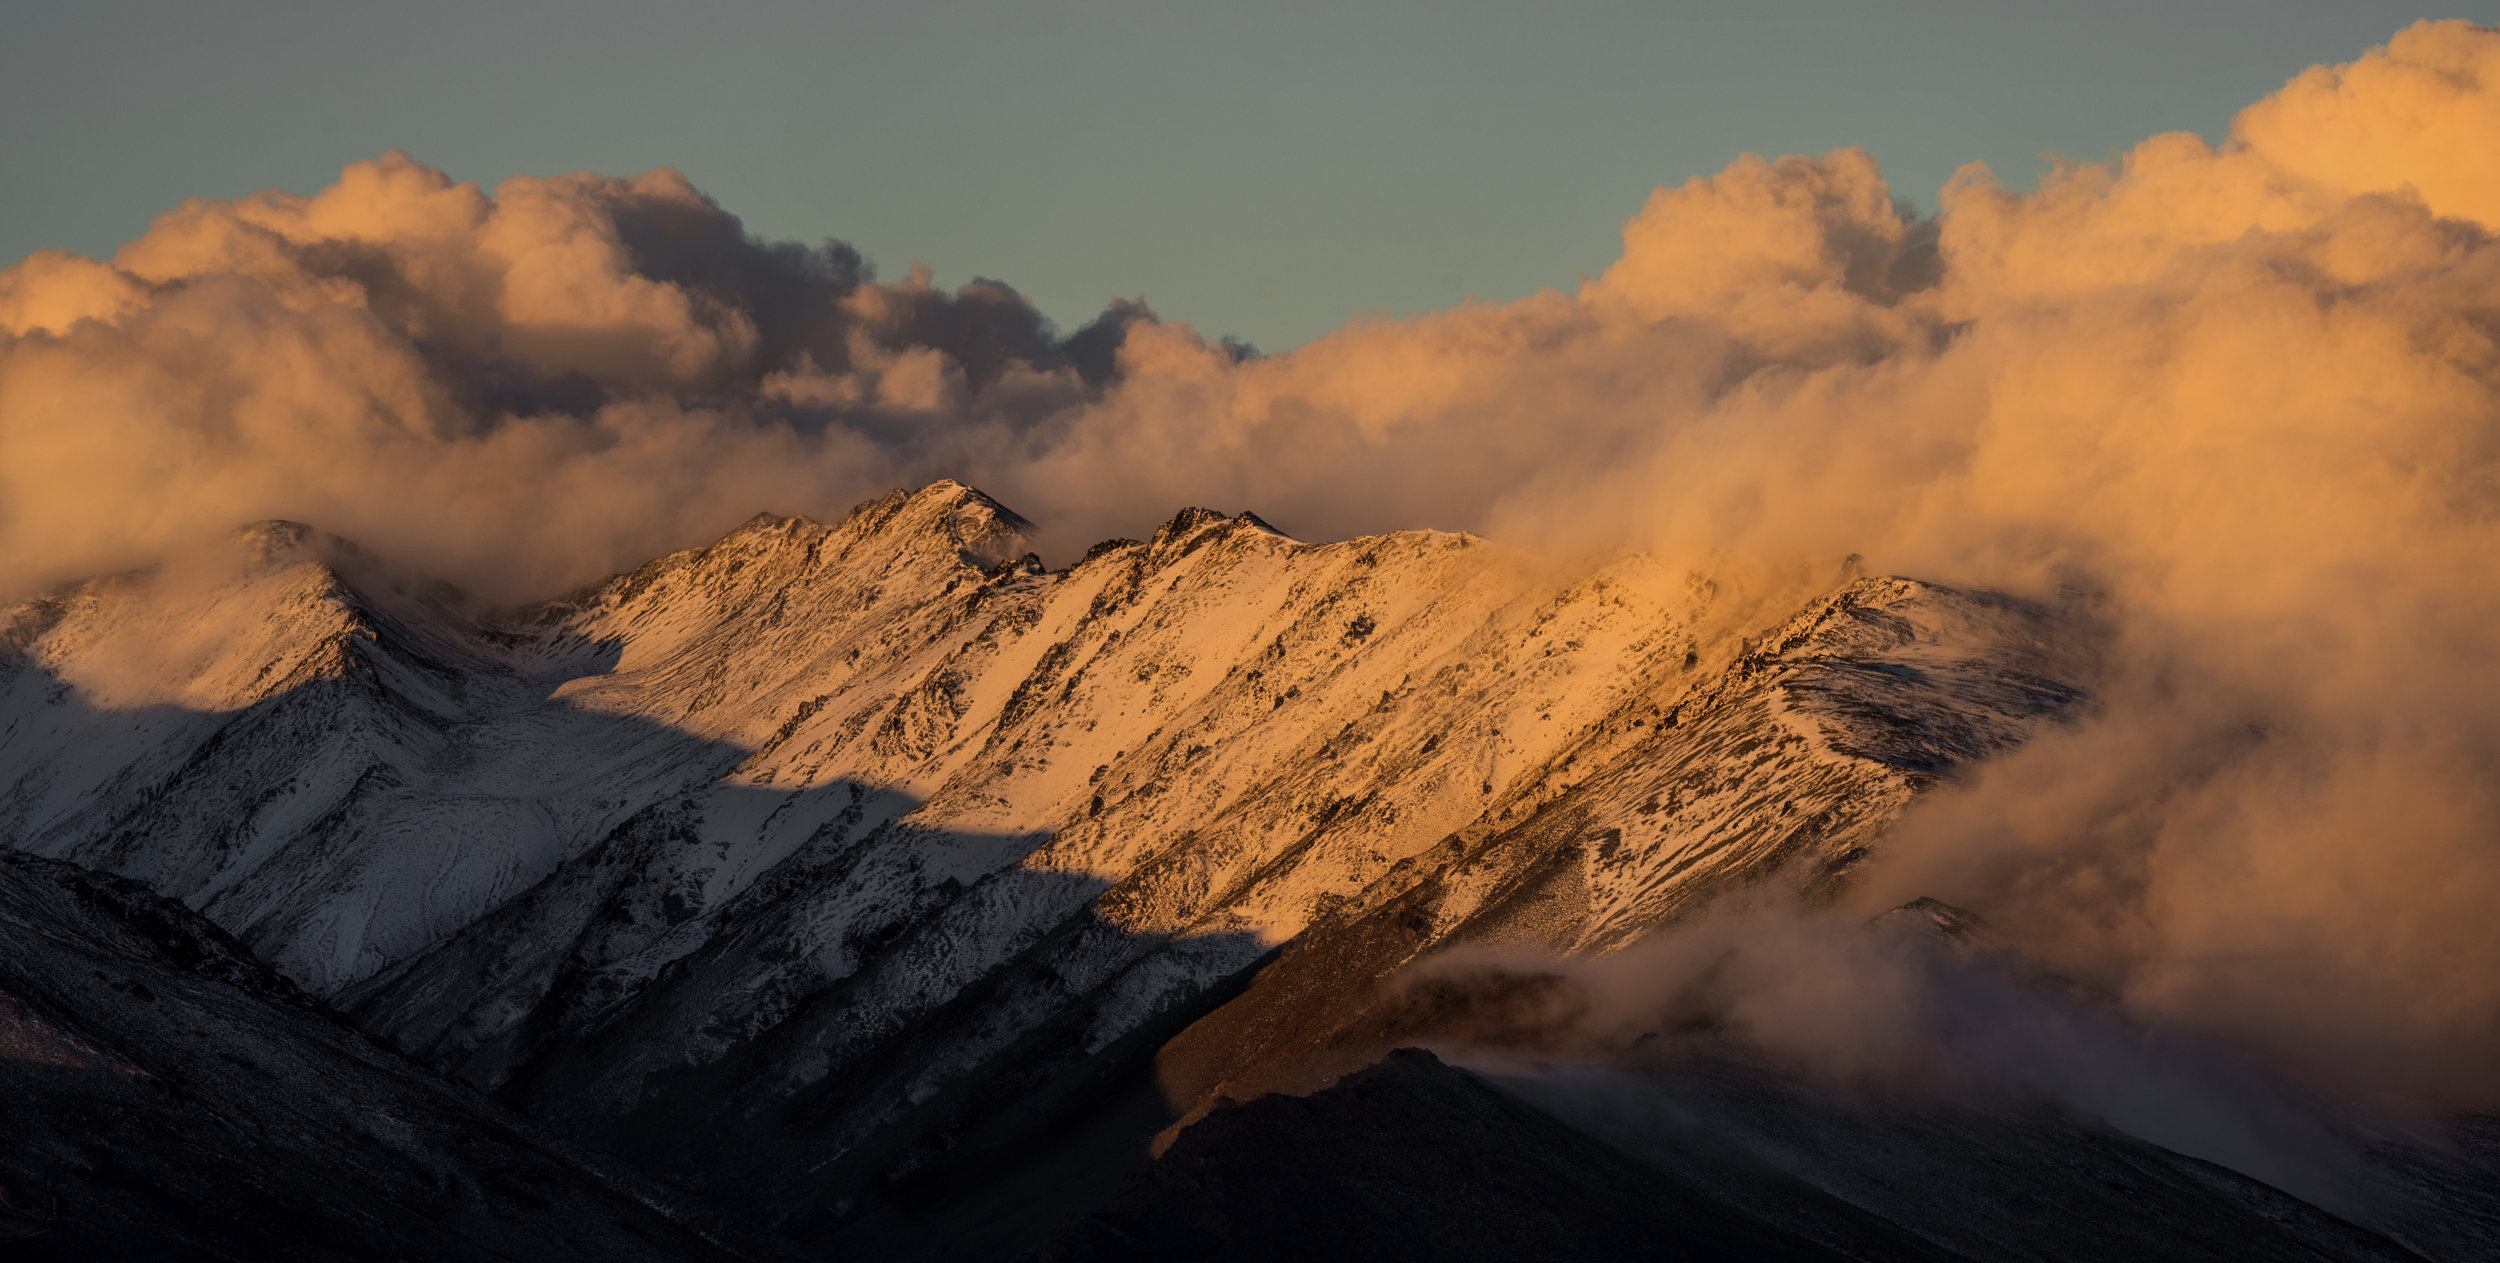 DSC02676_mountainclouds.jpg